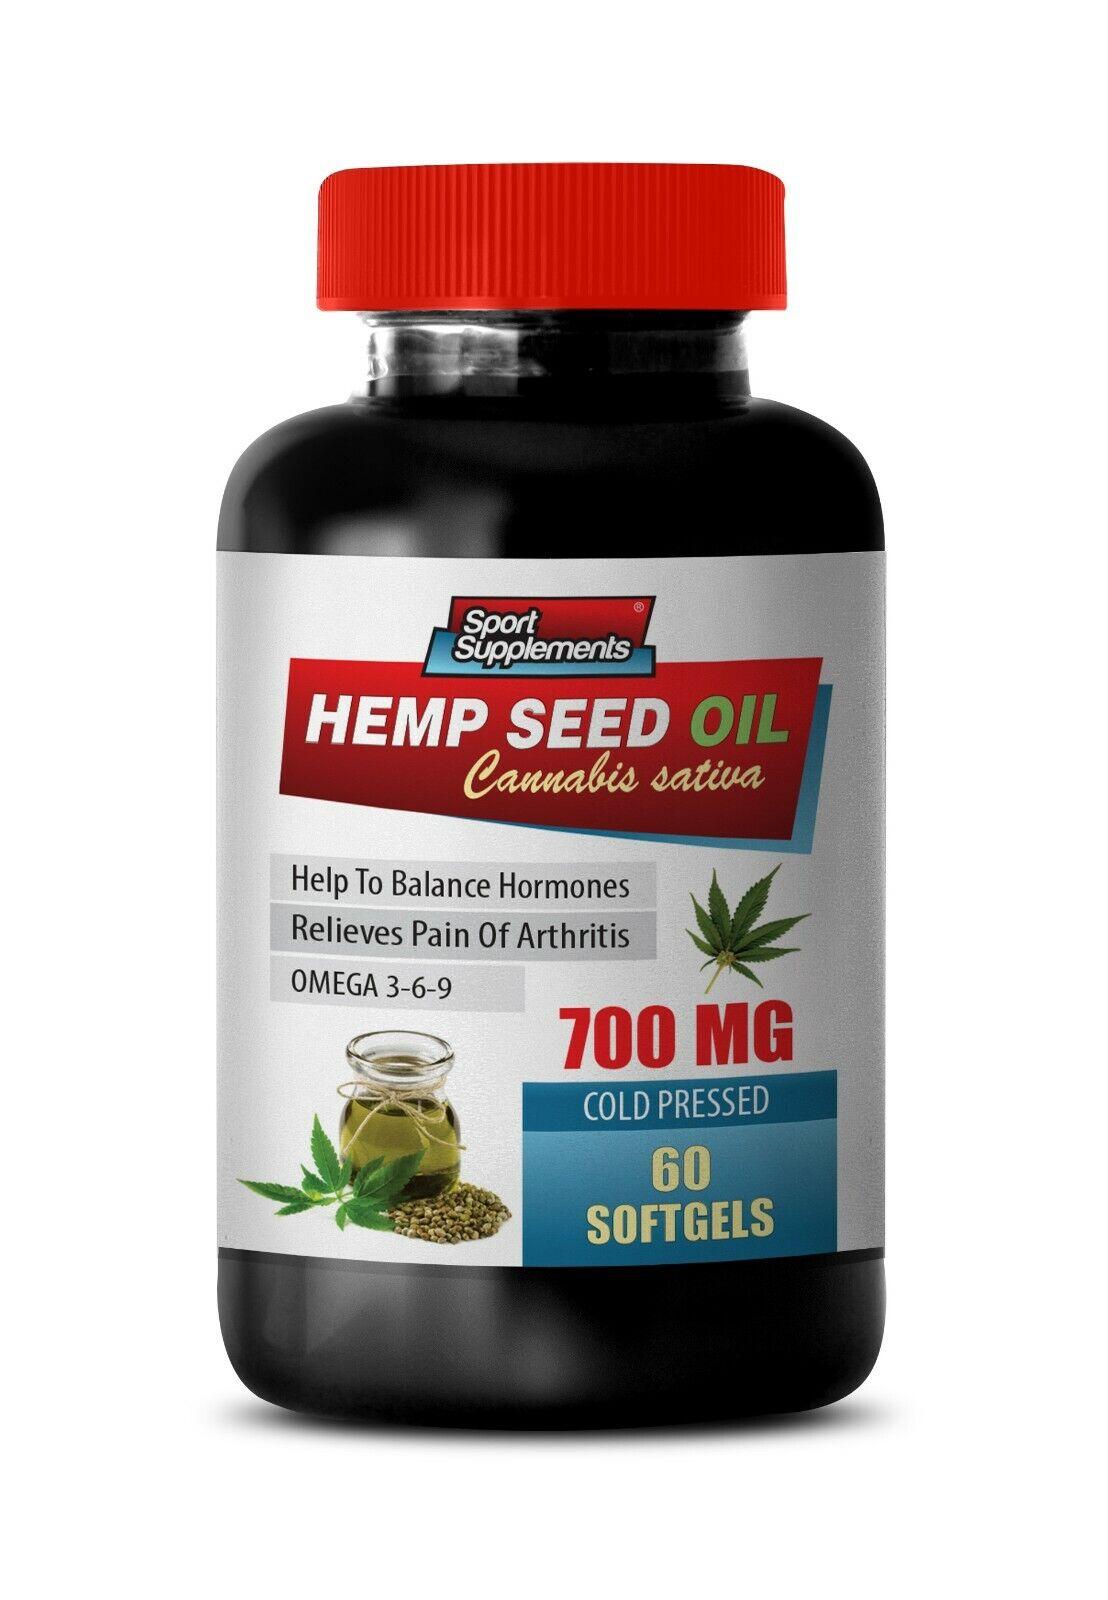 hormone balance - HEMP SEED OIL 700mg - super antioxidant - 1 Bottle